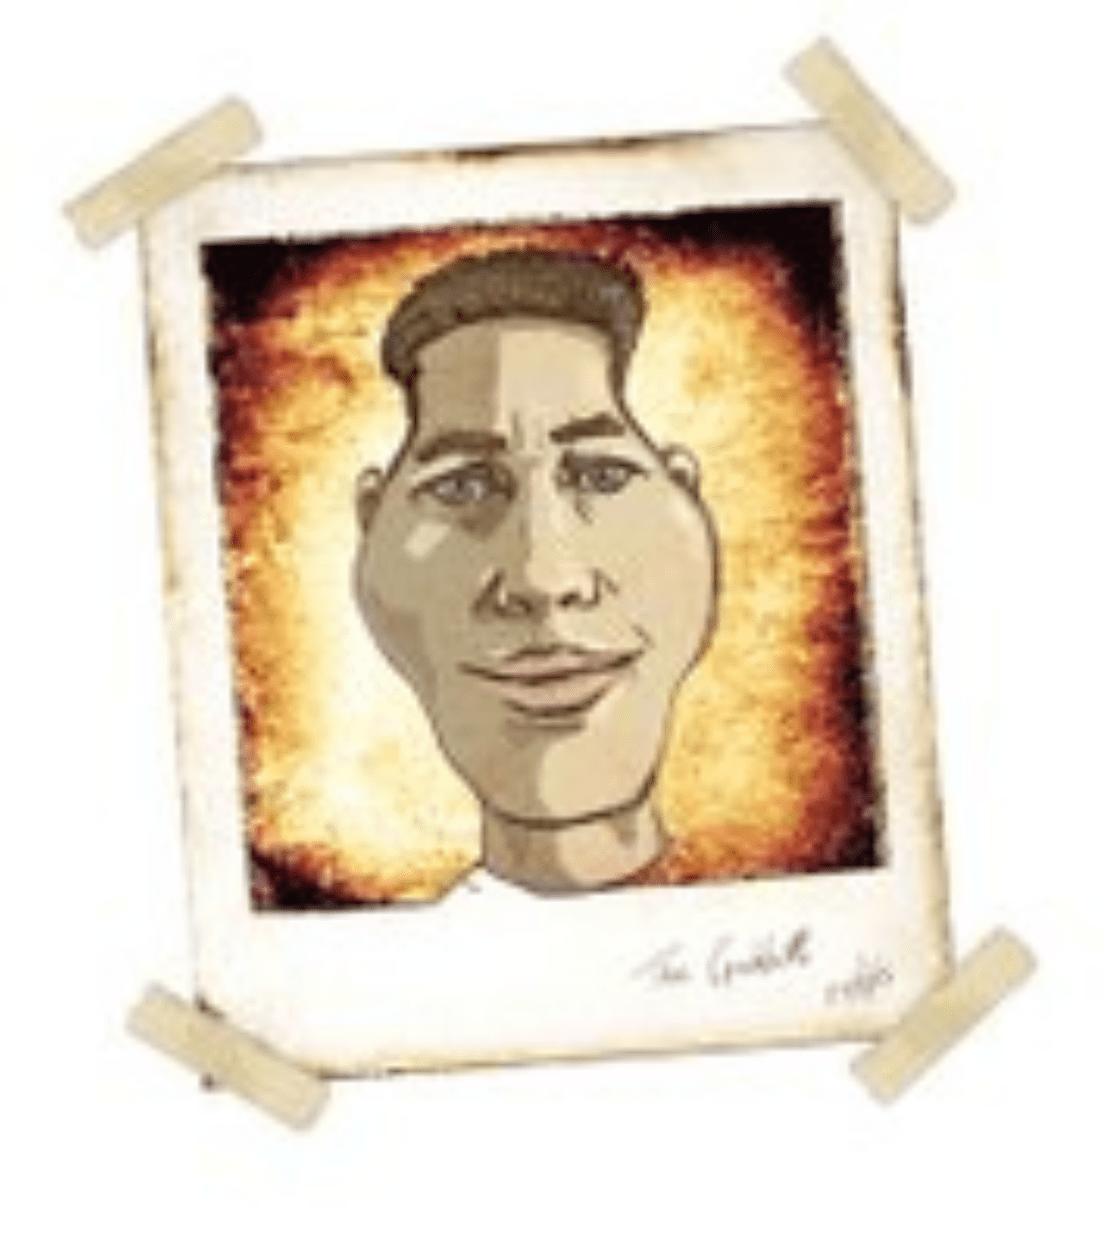 cartoony depiction of Grant Abbitt's portrait